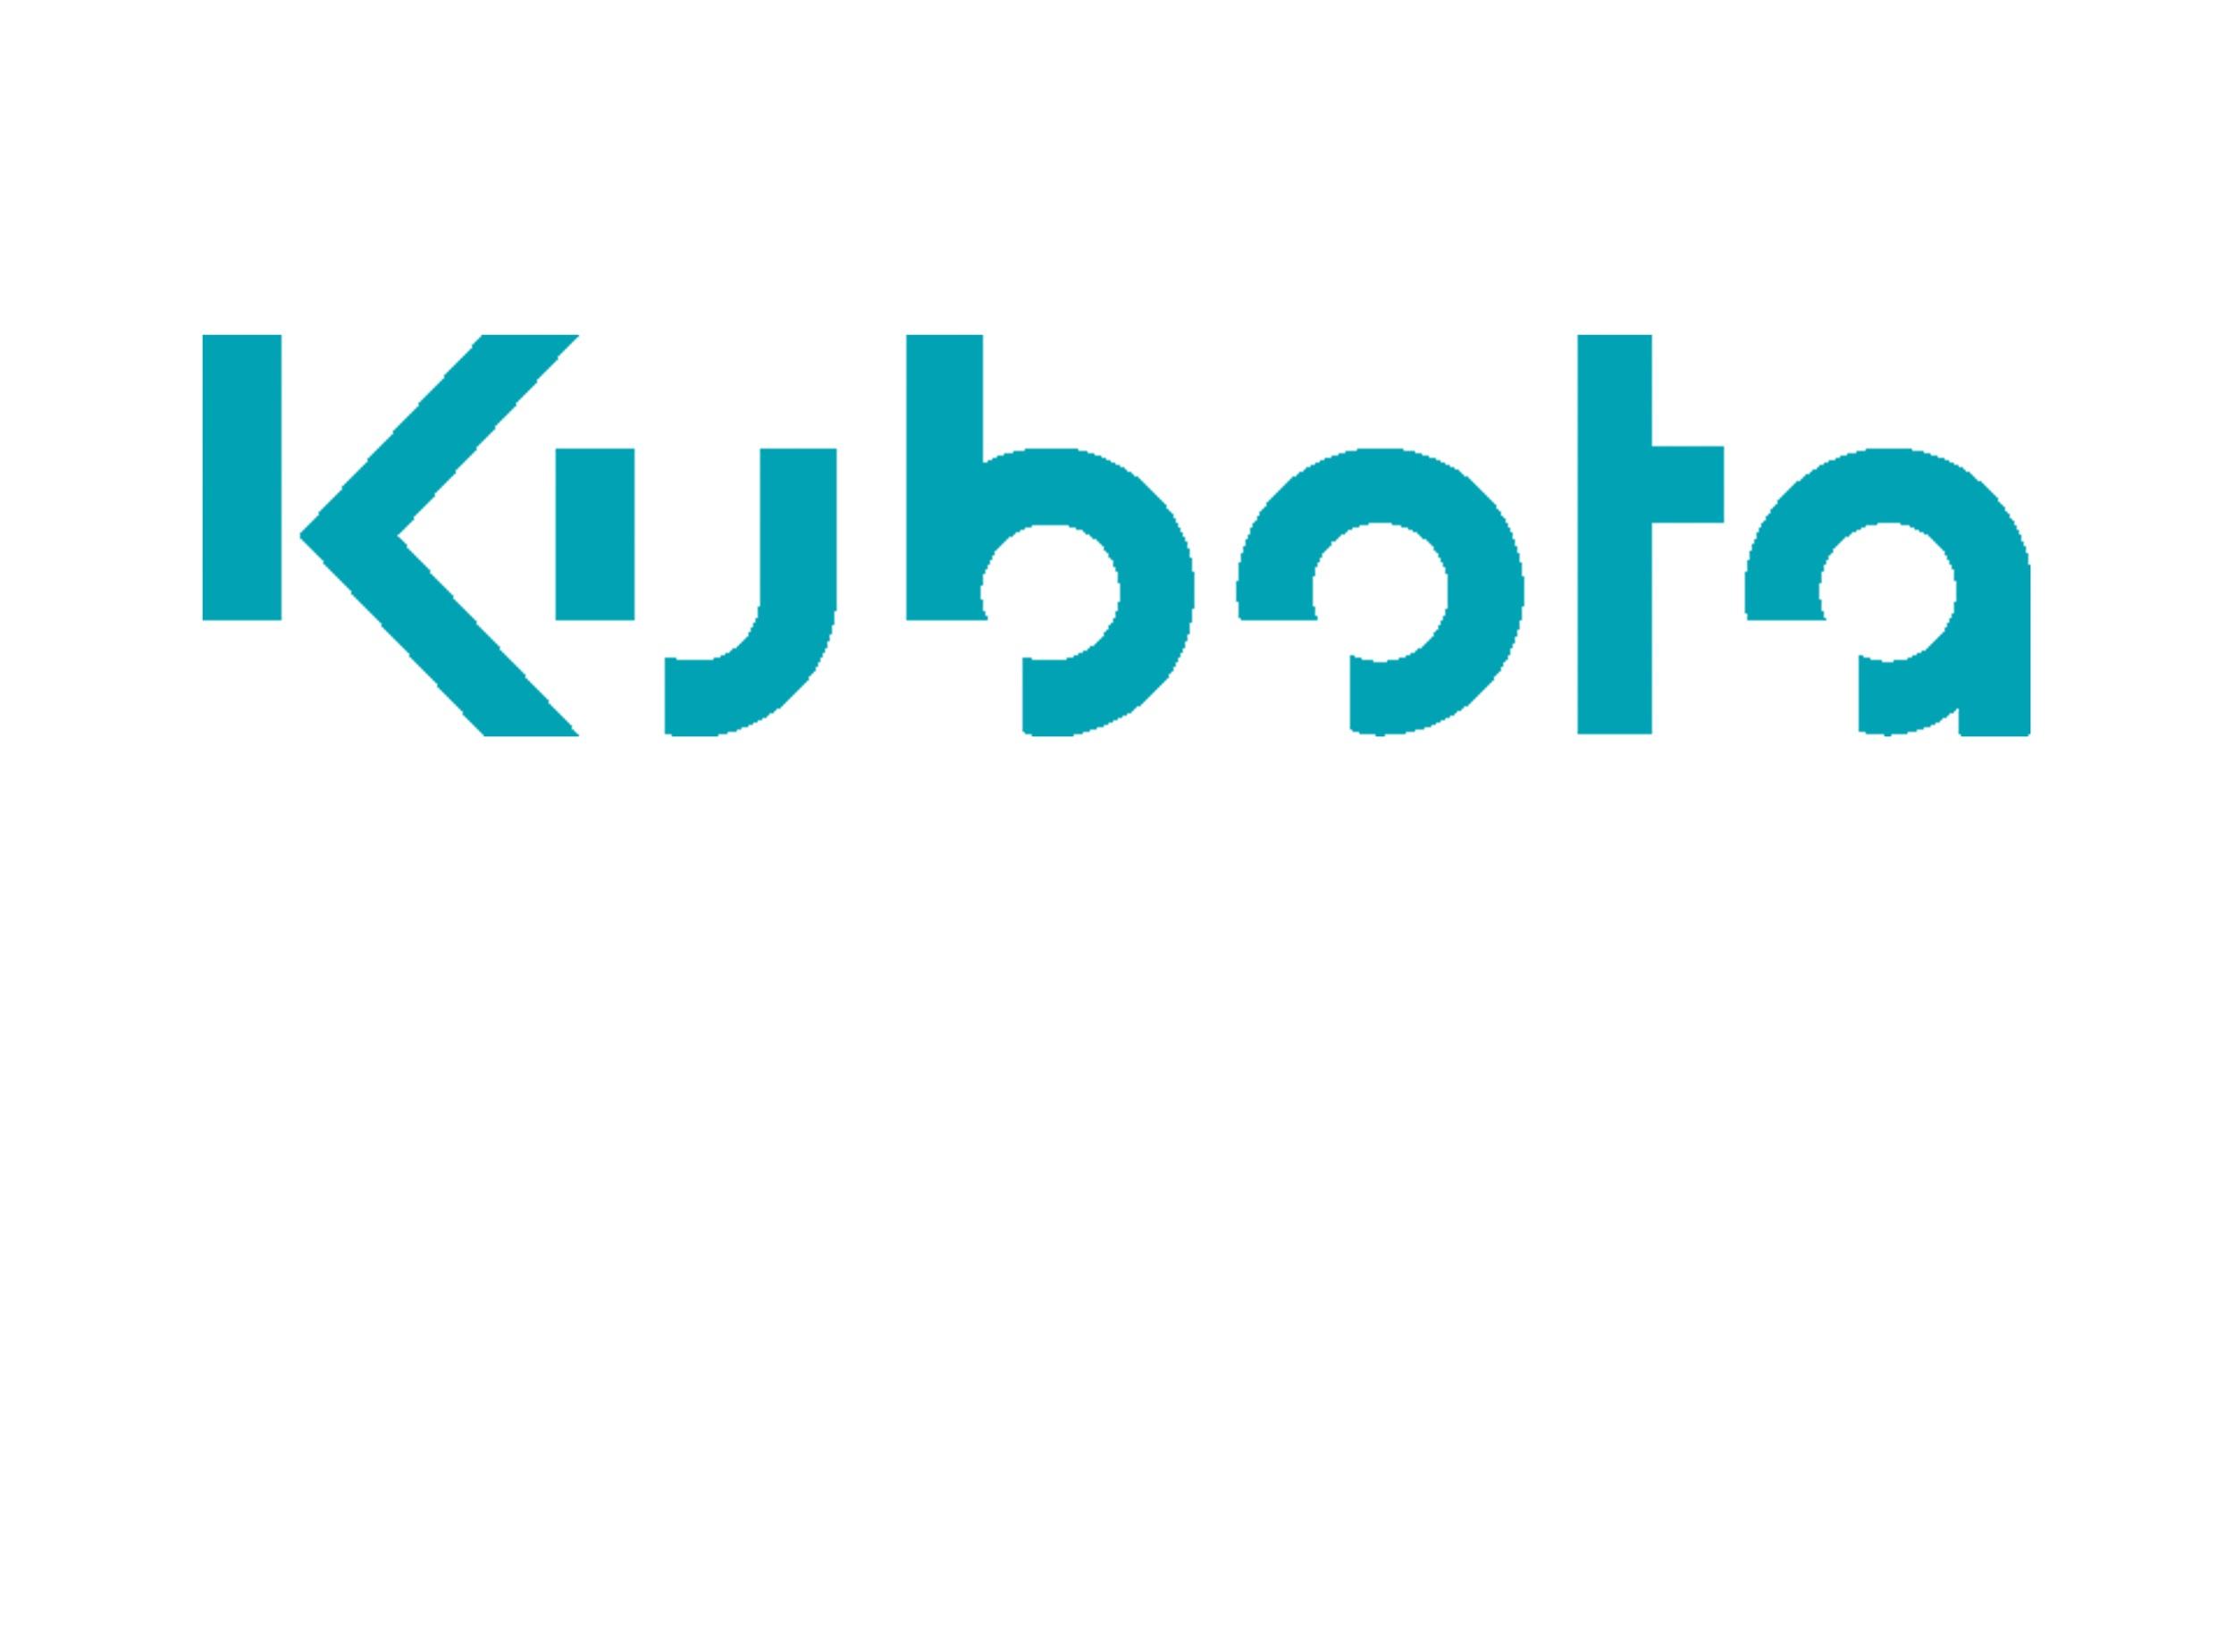 Kubota_teal.jpg